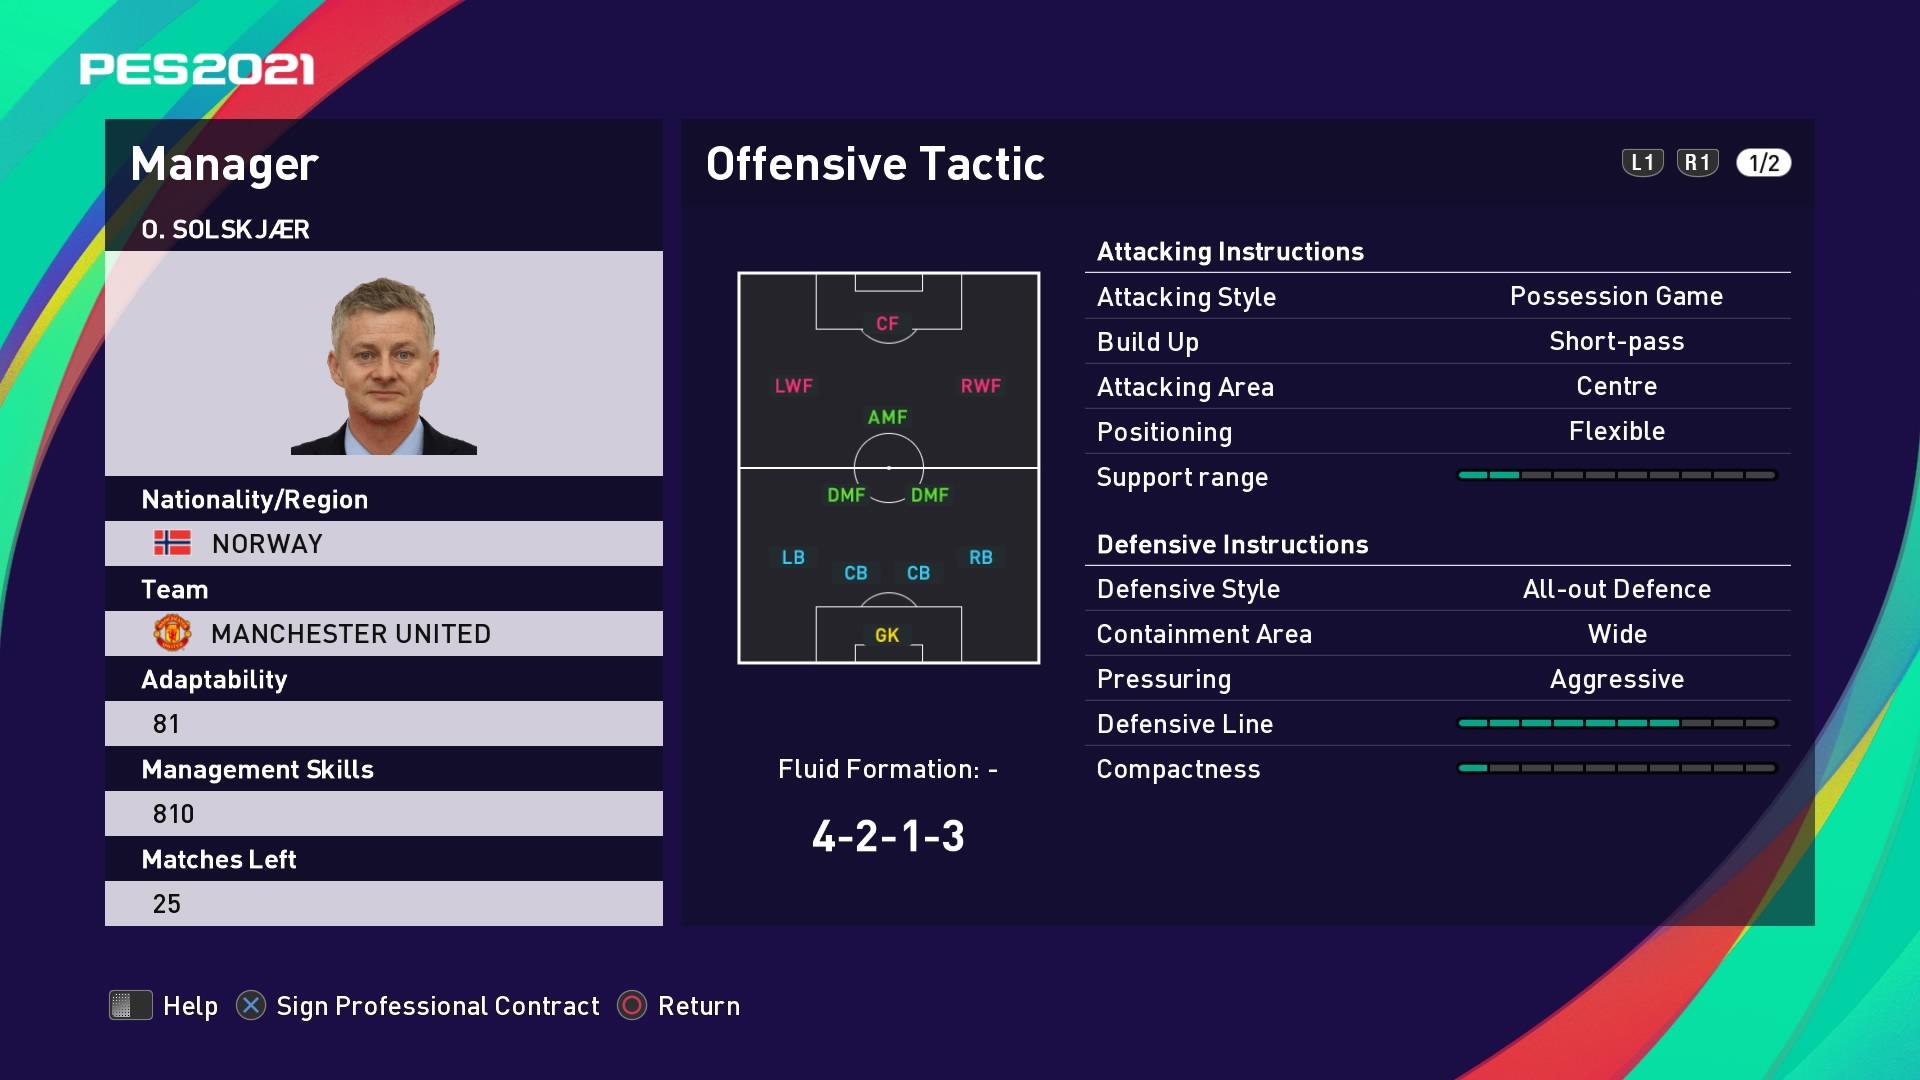 O. Solskjaer (Ole Gunnar Solskjær) Offensive Tactic in PES 2021 myClub